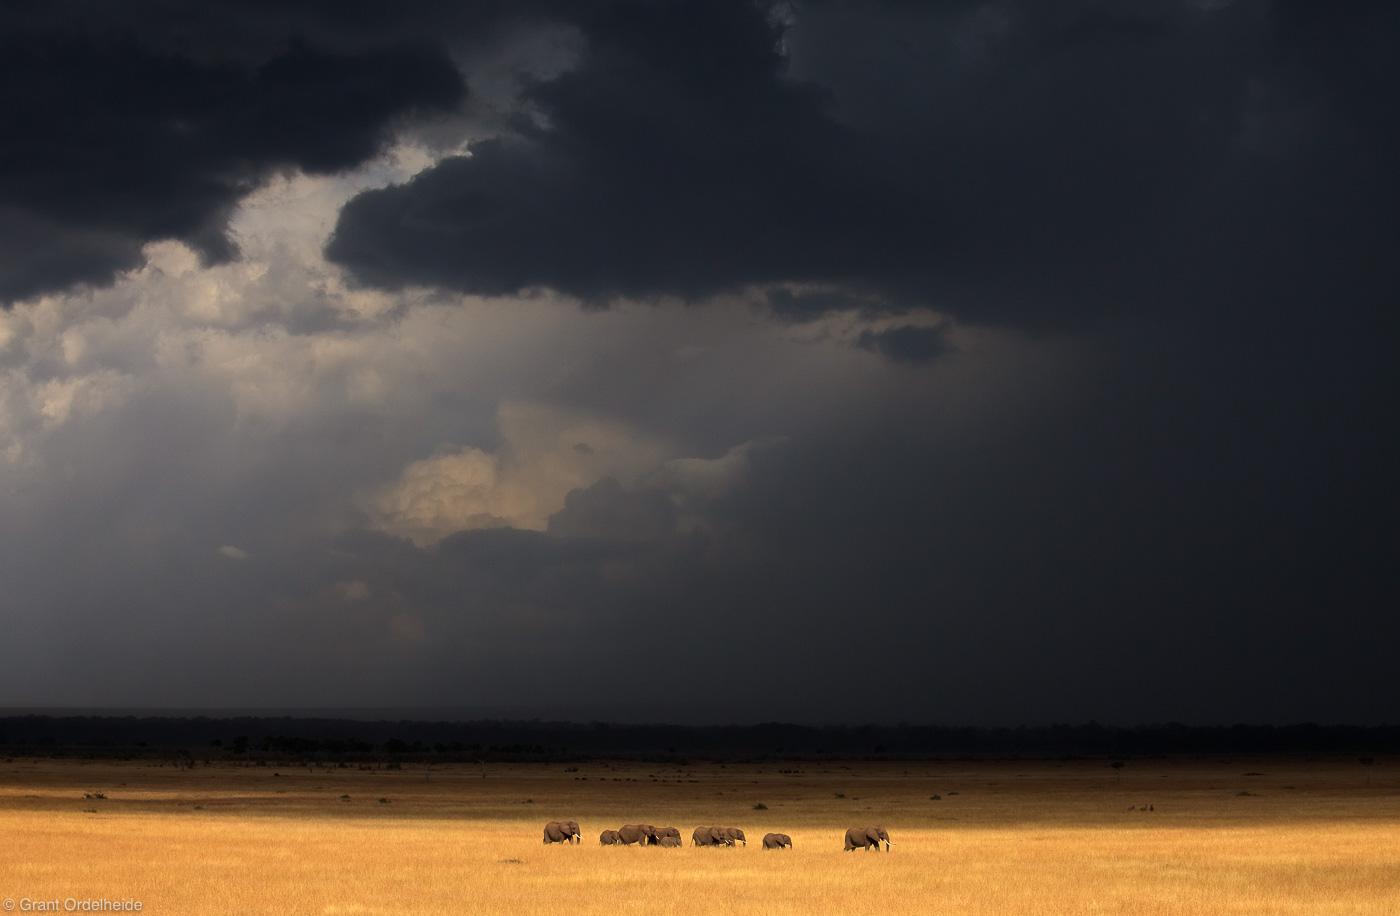 elephants, herd, approaching, storm, masai, mara, kenya, africa, torrential, storm